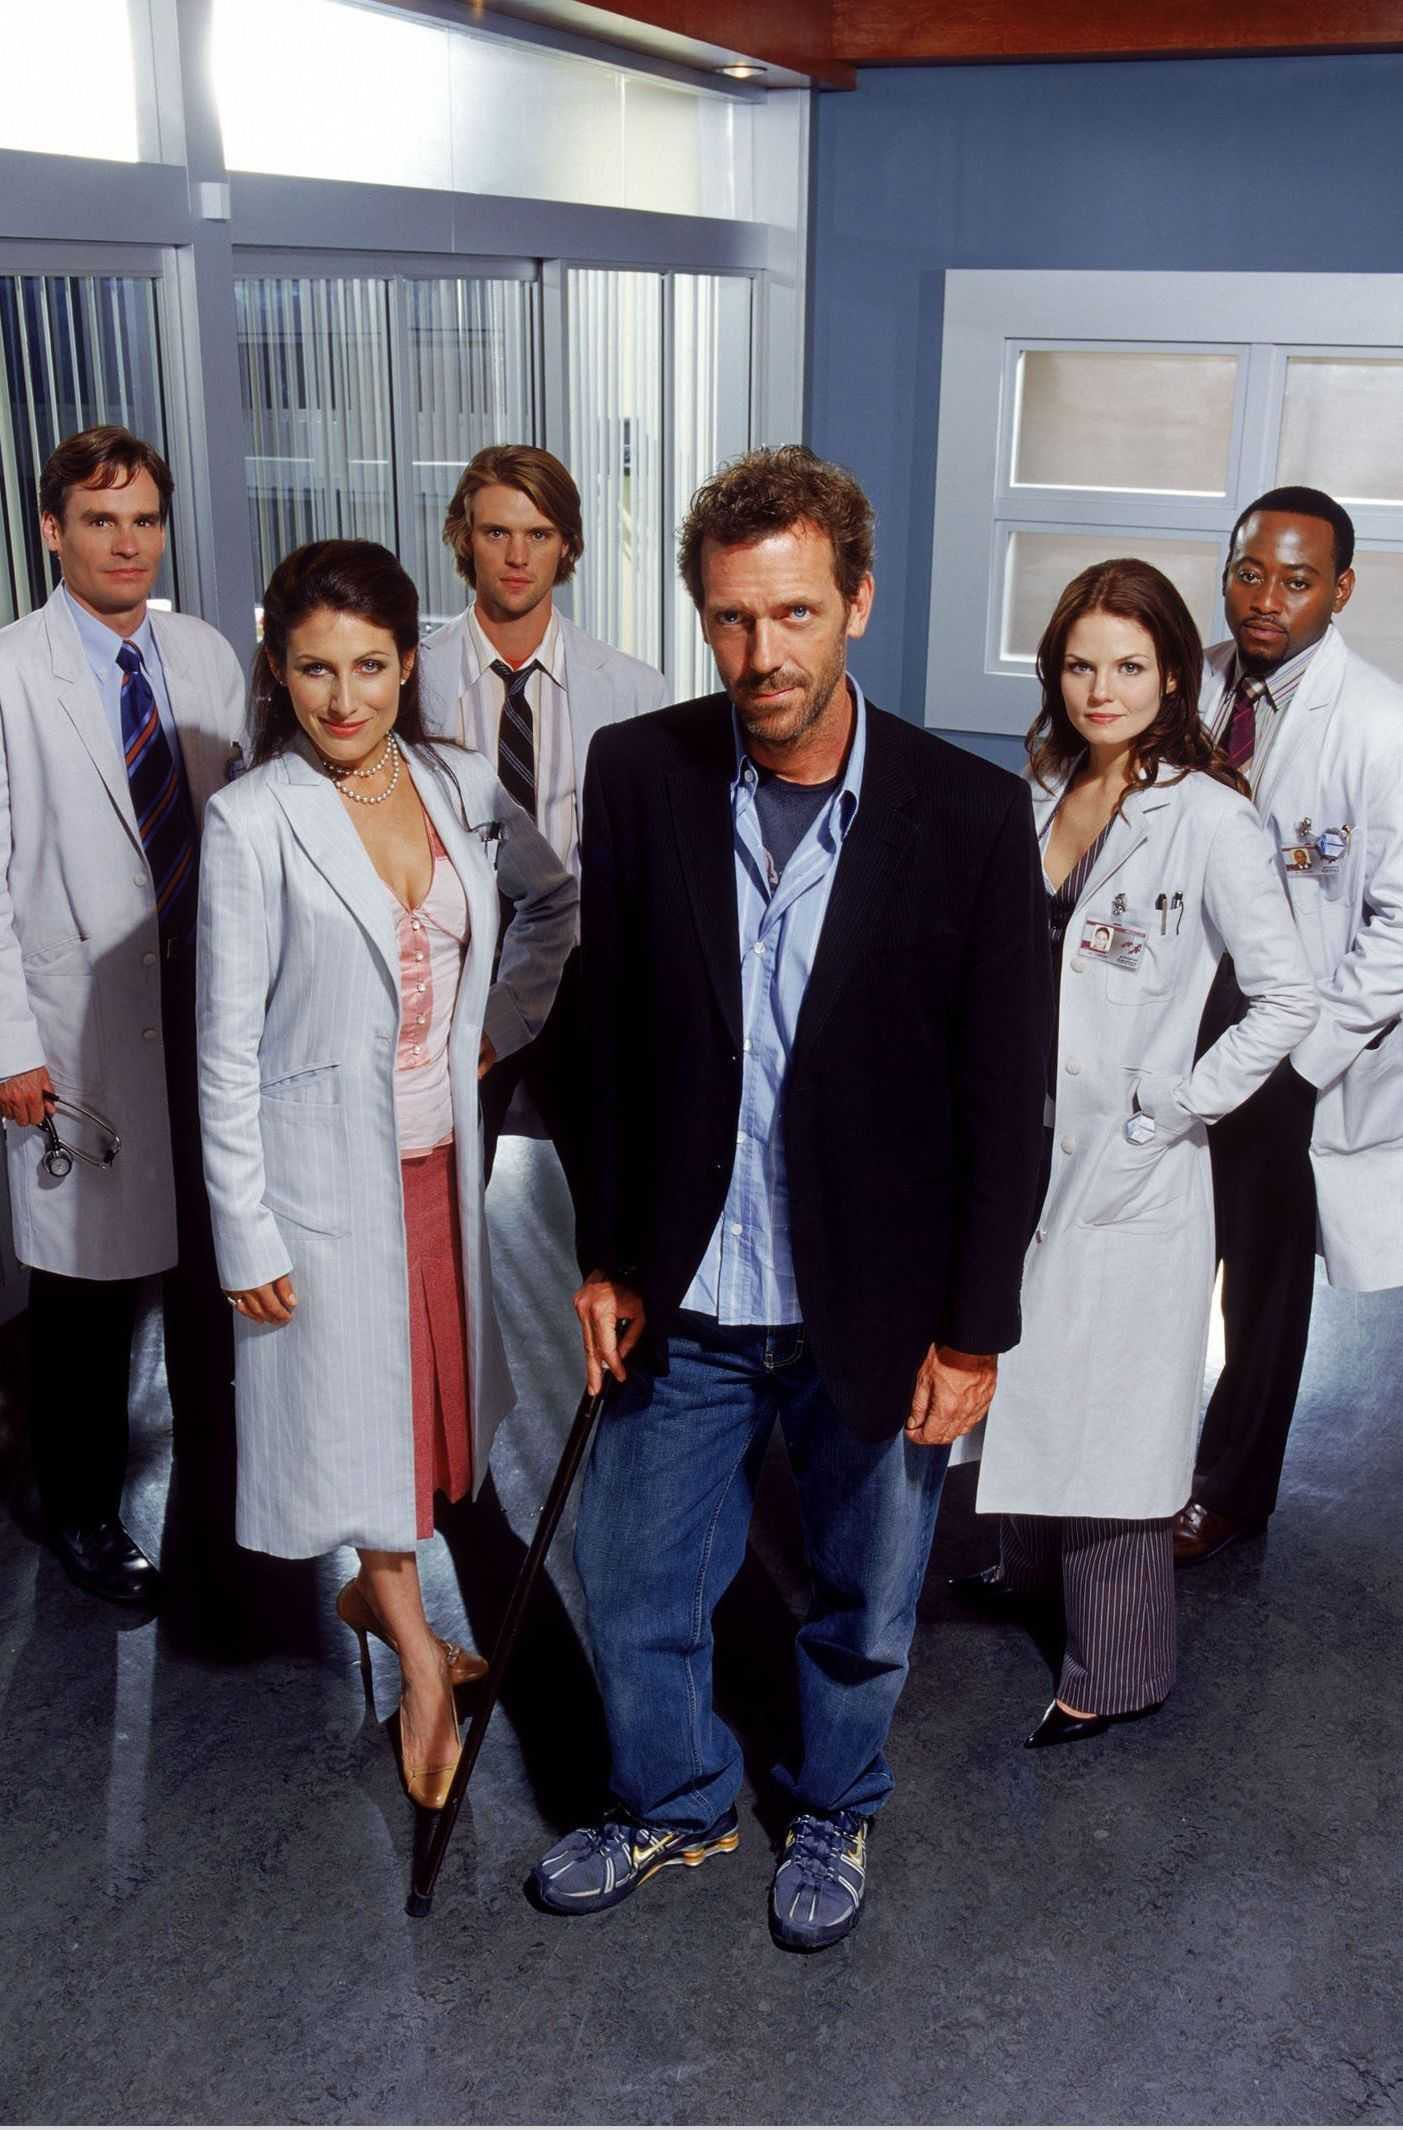 House Season 1 Promo House md, Hugh laurie, Dr house